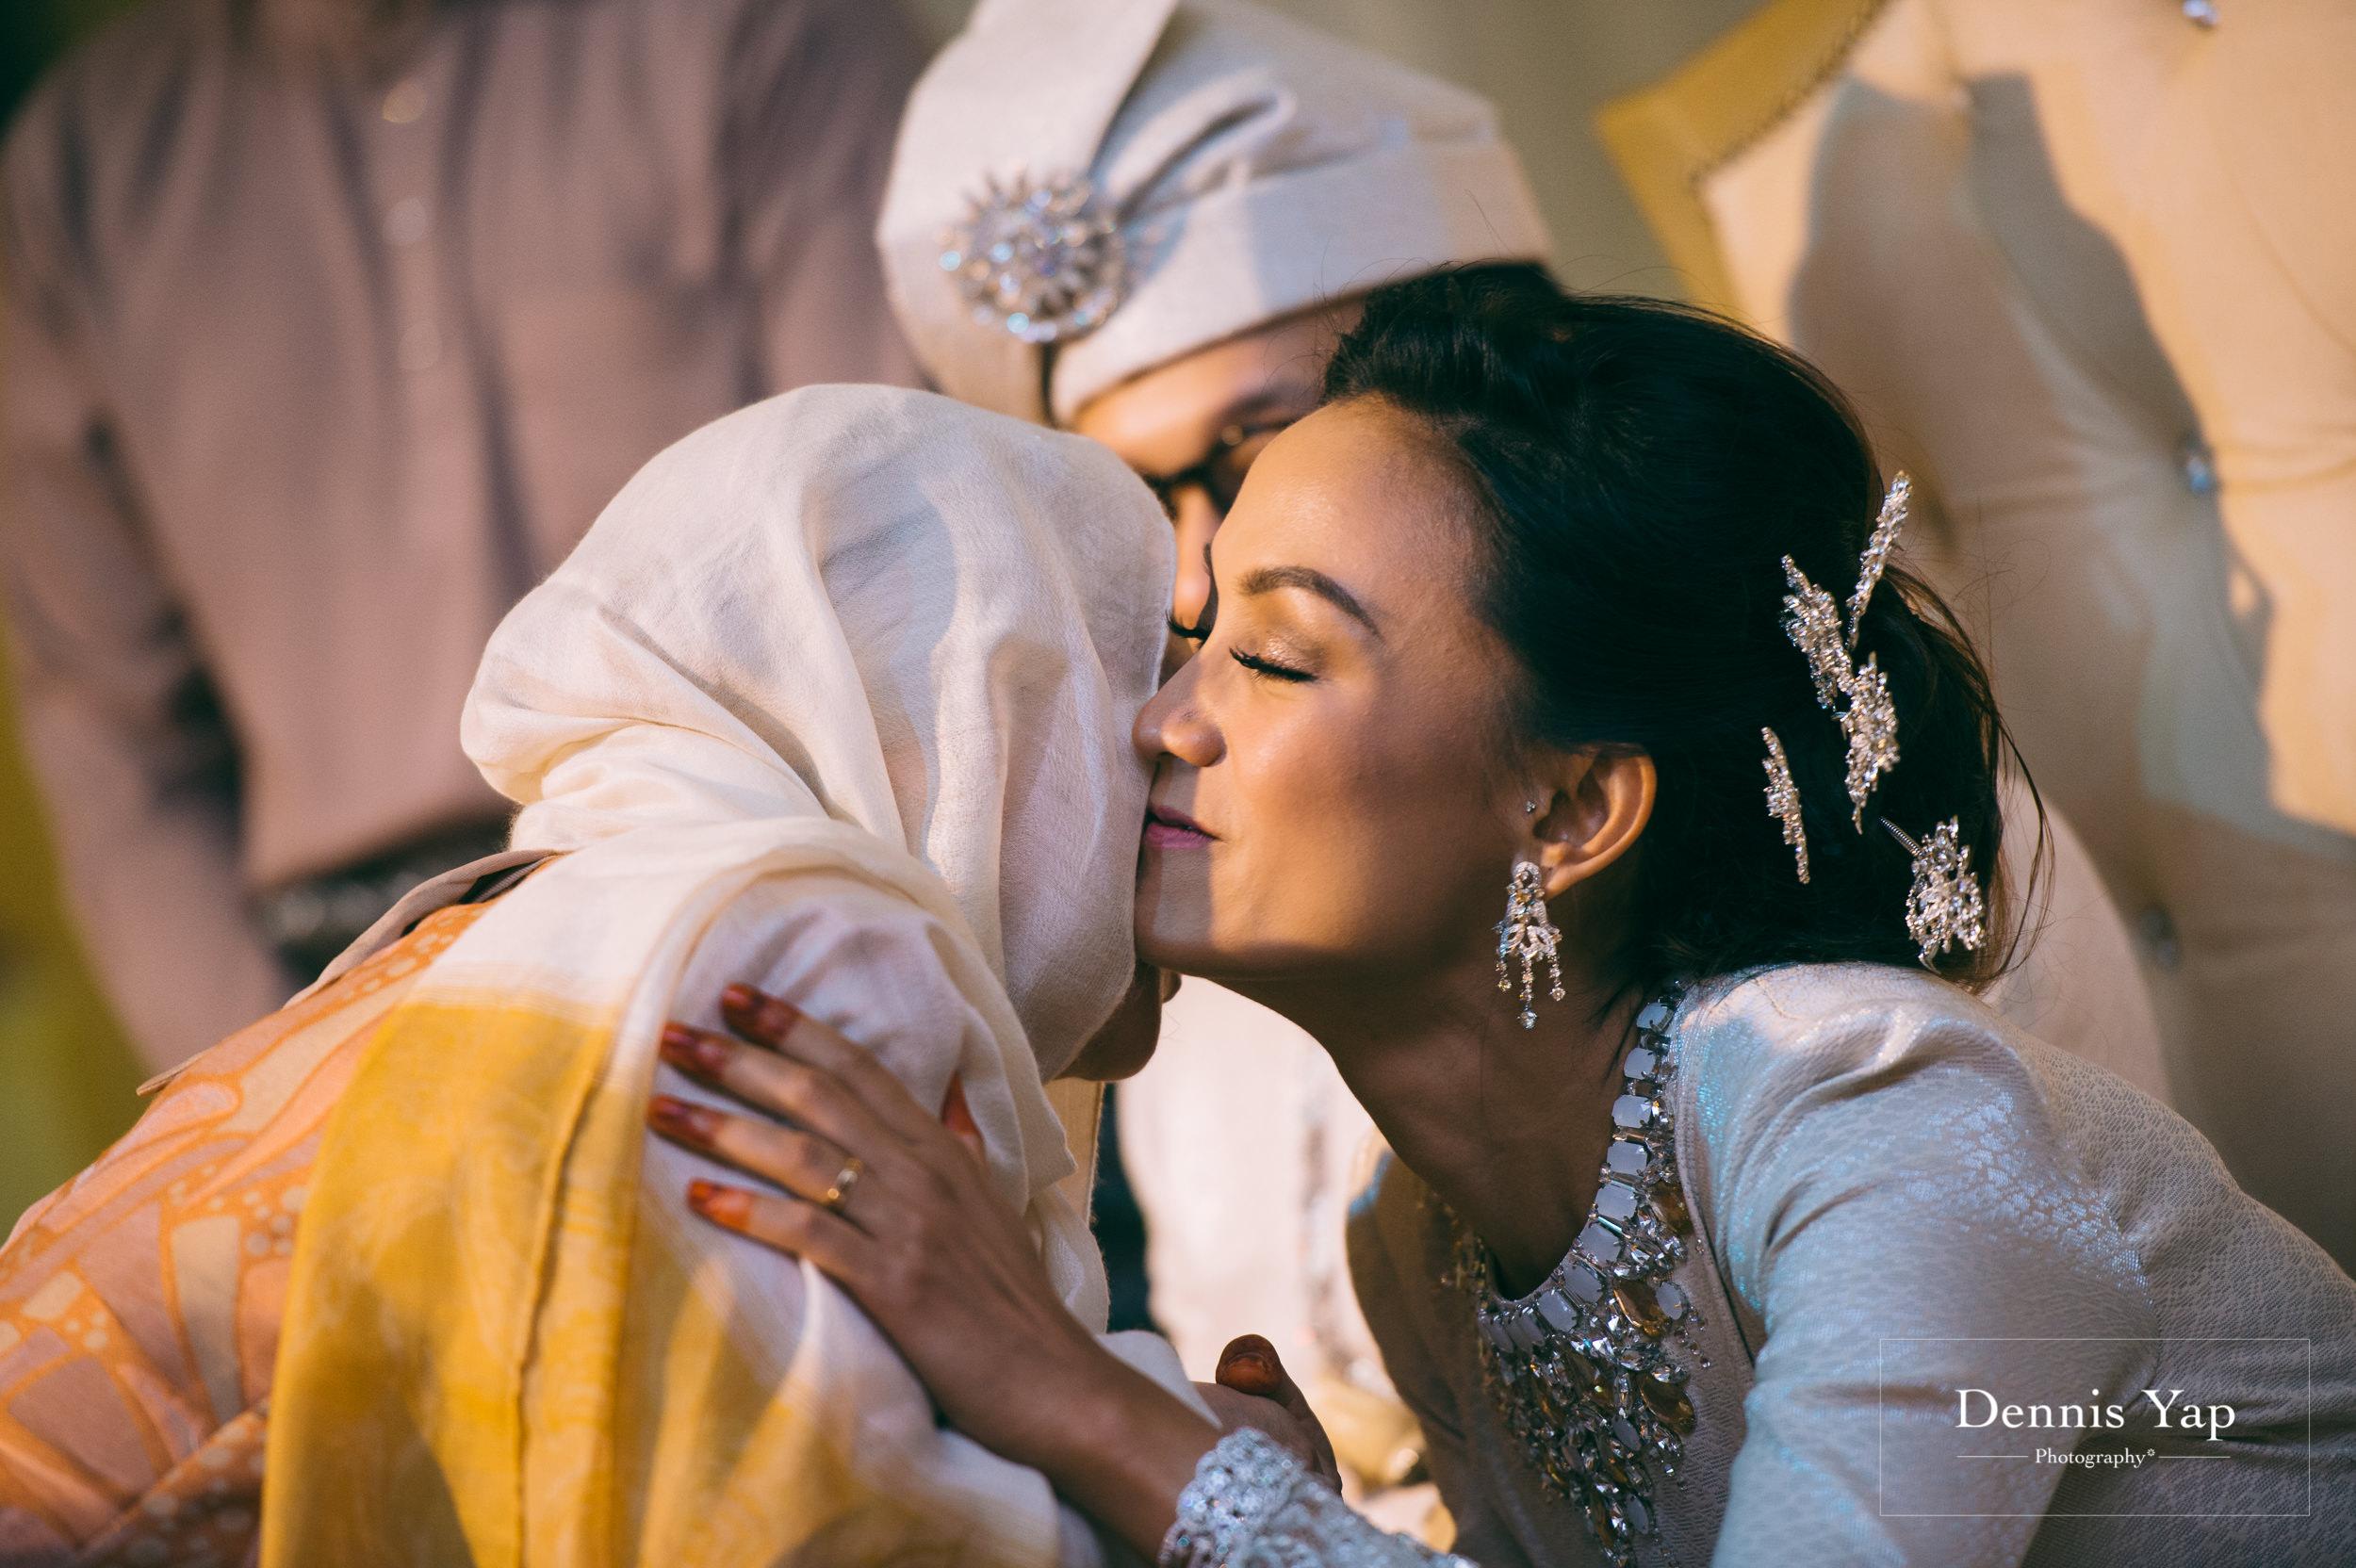 zarif hanalili malay wedding blessing ceremony dennis yap photography-19.jpg